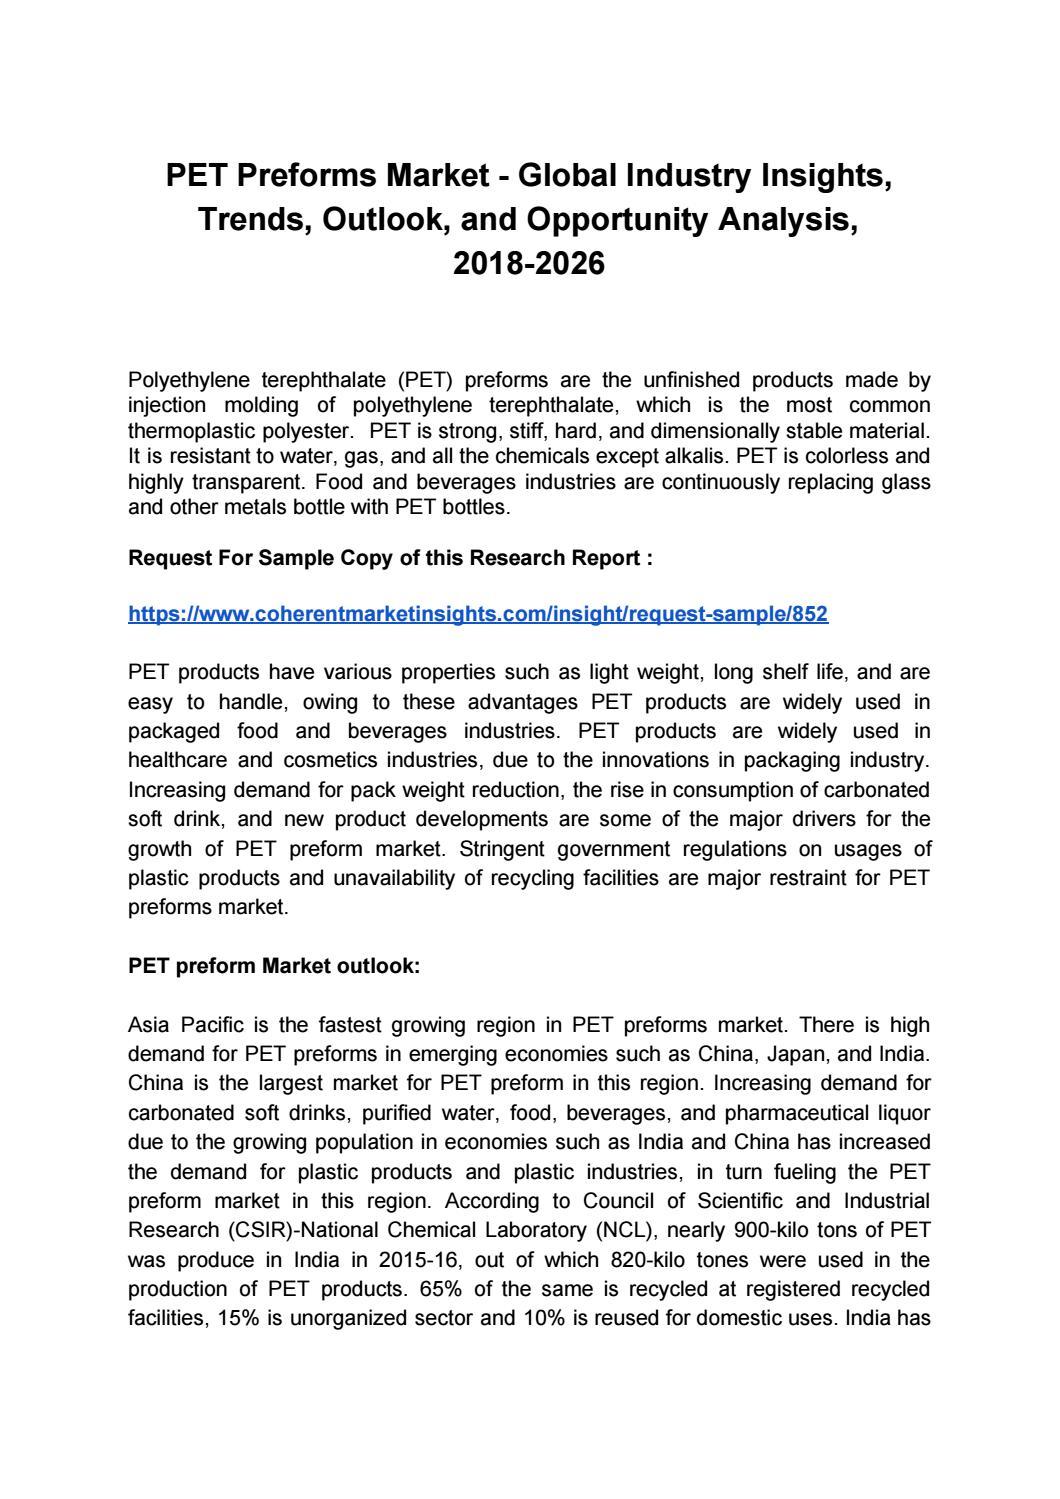 PET Preforms Market by coherentmarketinsights - issuu